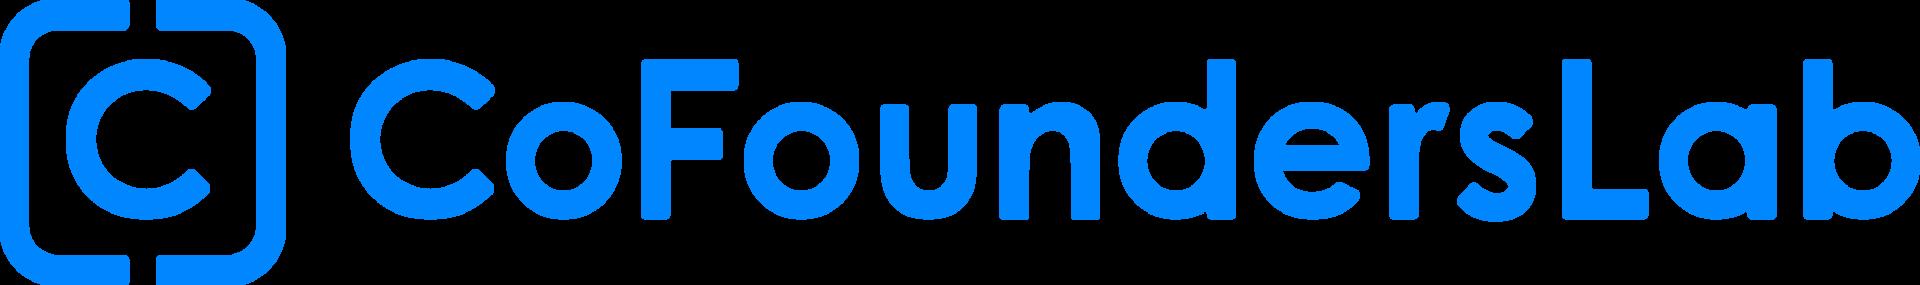 twuhfbu5Qse7xqMynuLB_cfl-logo-blue.png